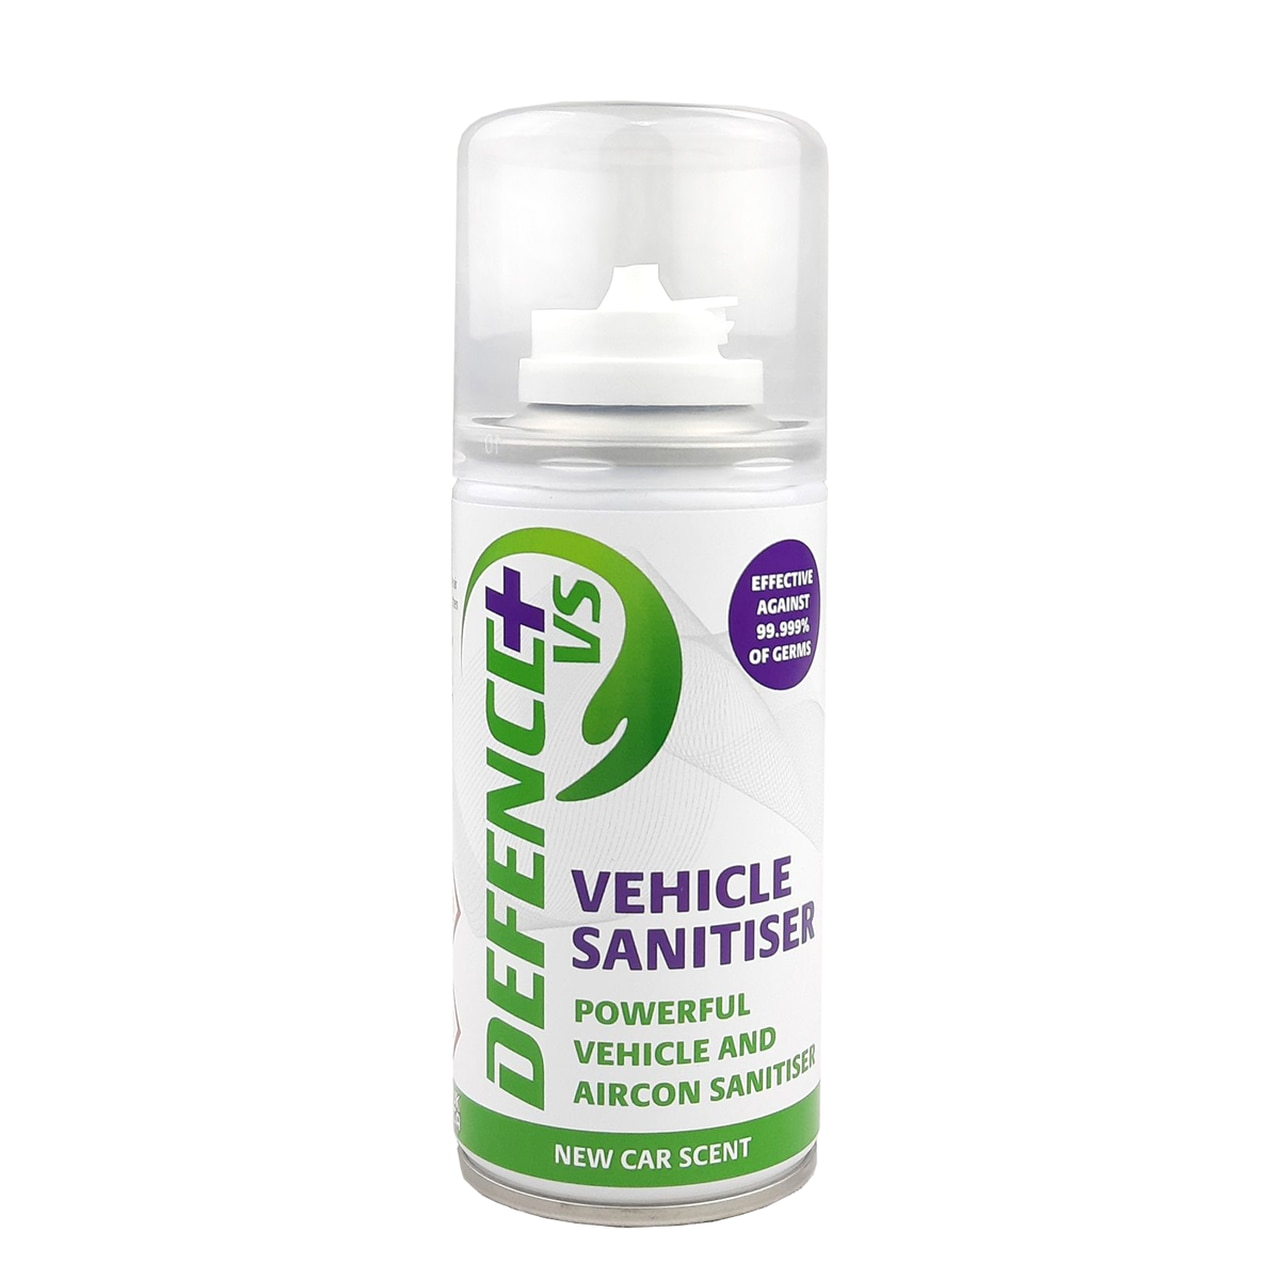 DEFENCE+ Vehicle Sanitiser - D202 - 150ml - Box of 12